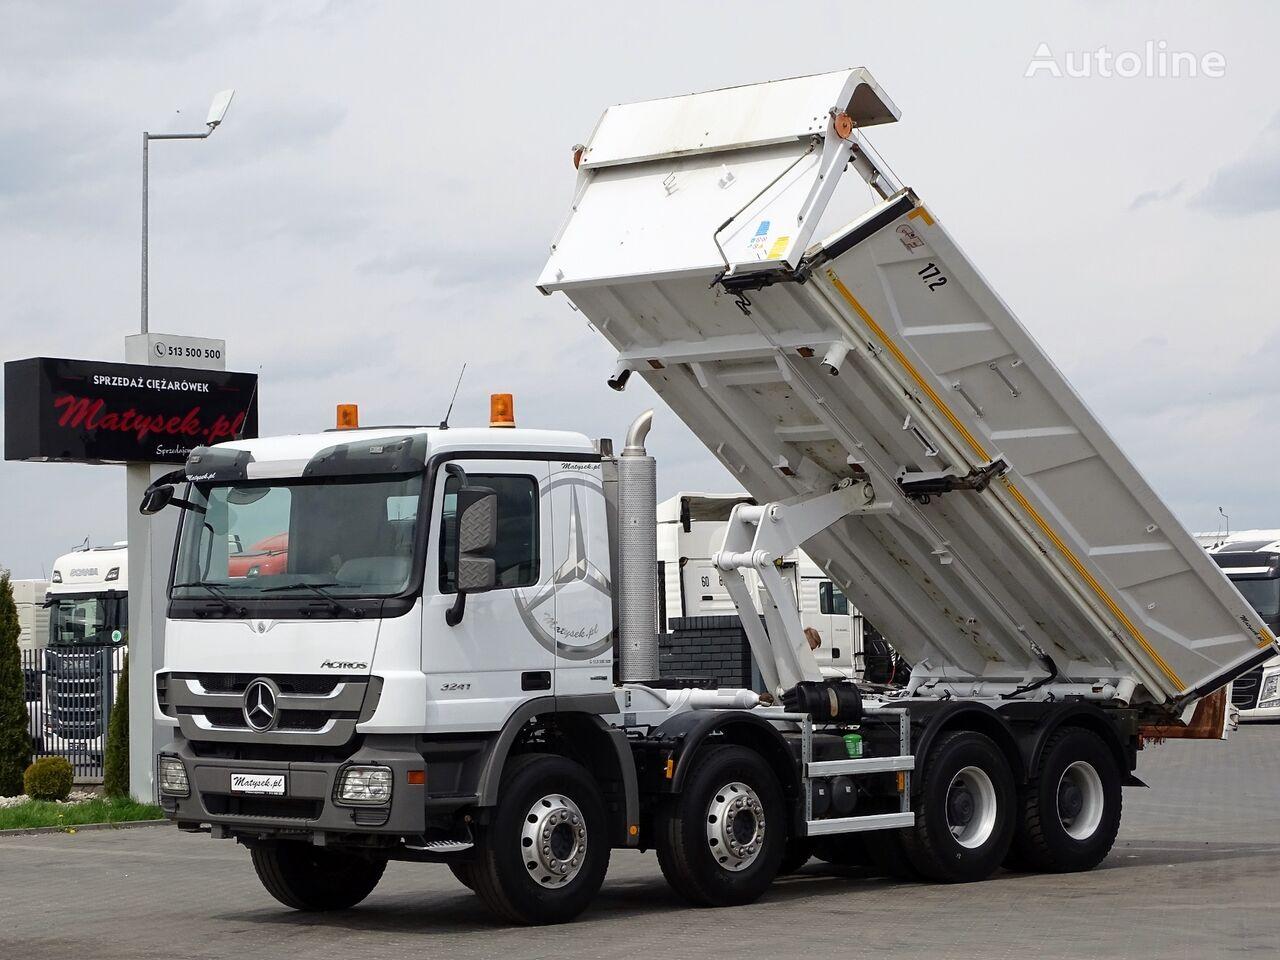 MERCEDES-BENZ ACTROS 3241/ 2 SIDED KIPPER / BORTMATIC / dump truck